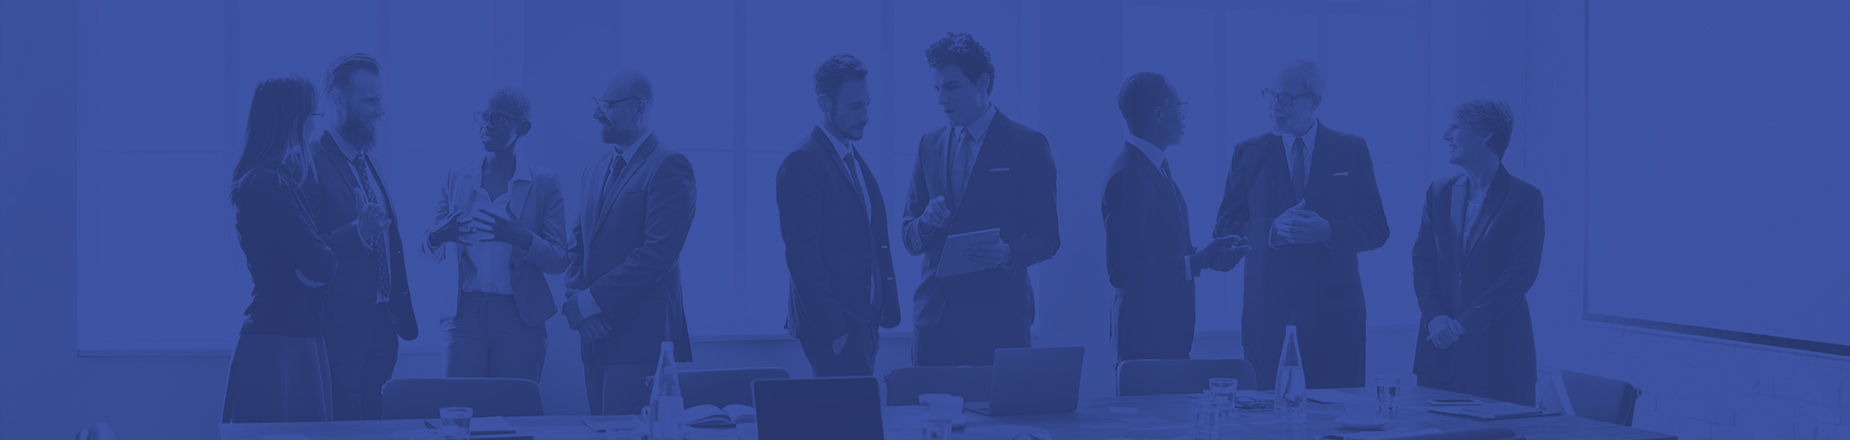 India's Top SAP Business One Gold Partner | SAP B1 ERP | Uneecops